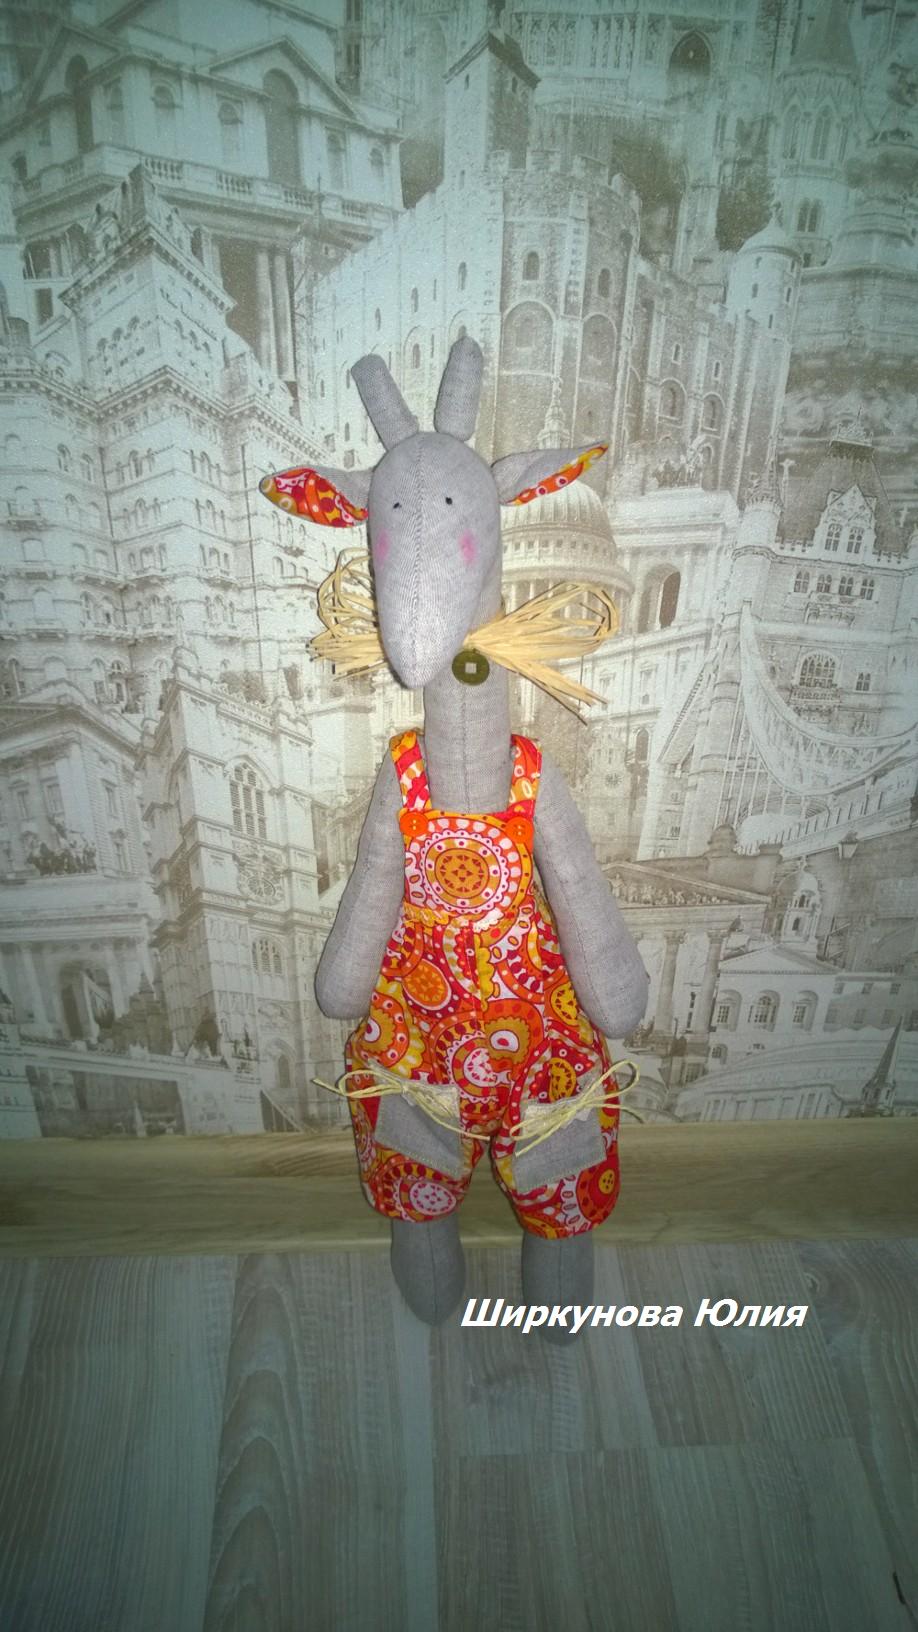 наподарок солнечныйжираф игрушка тильда жираф интерьернаяигрушка